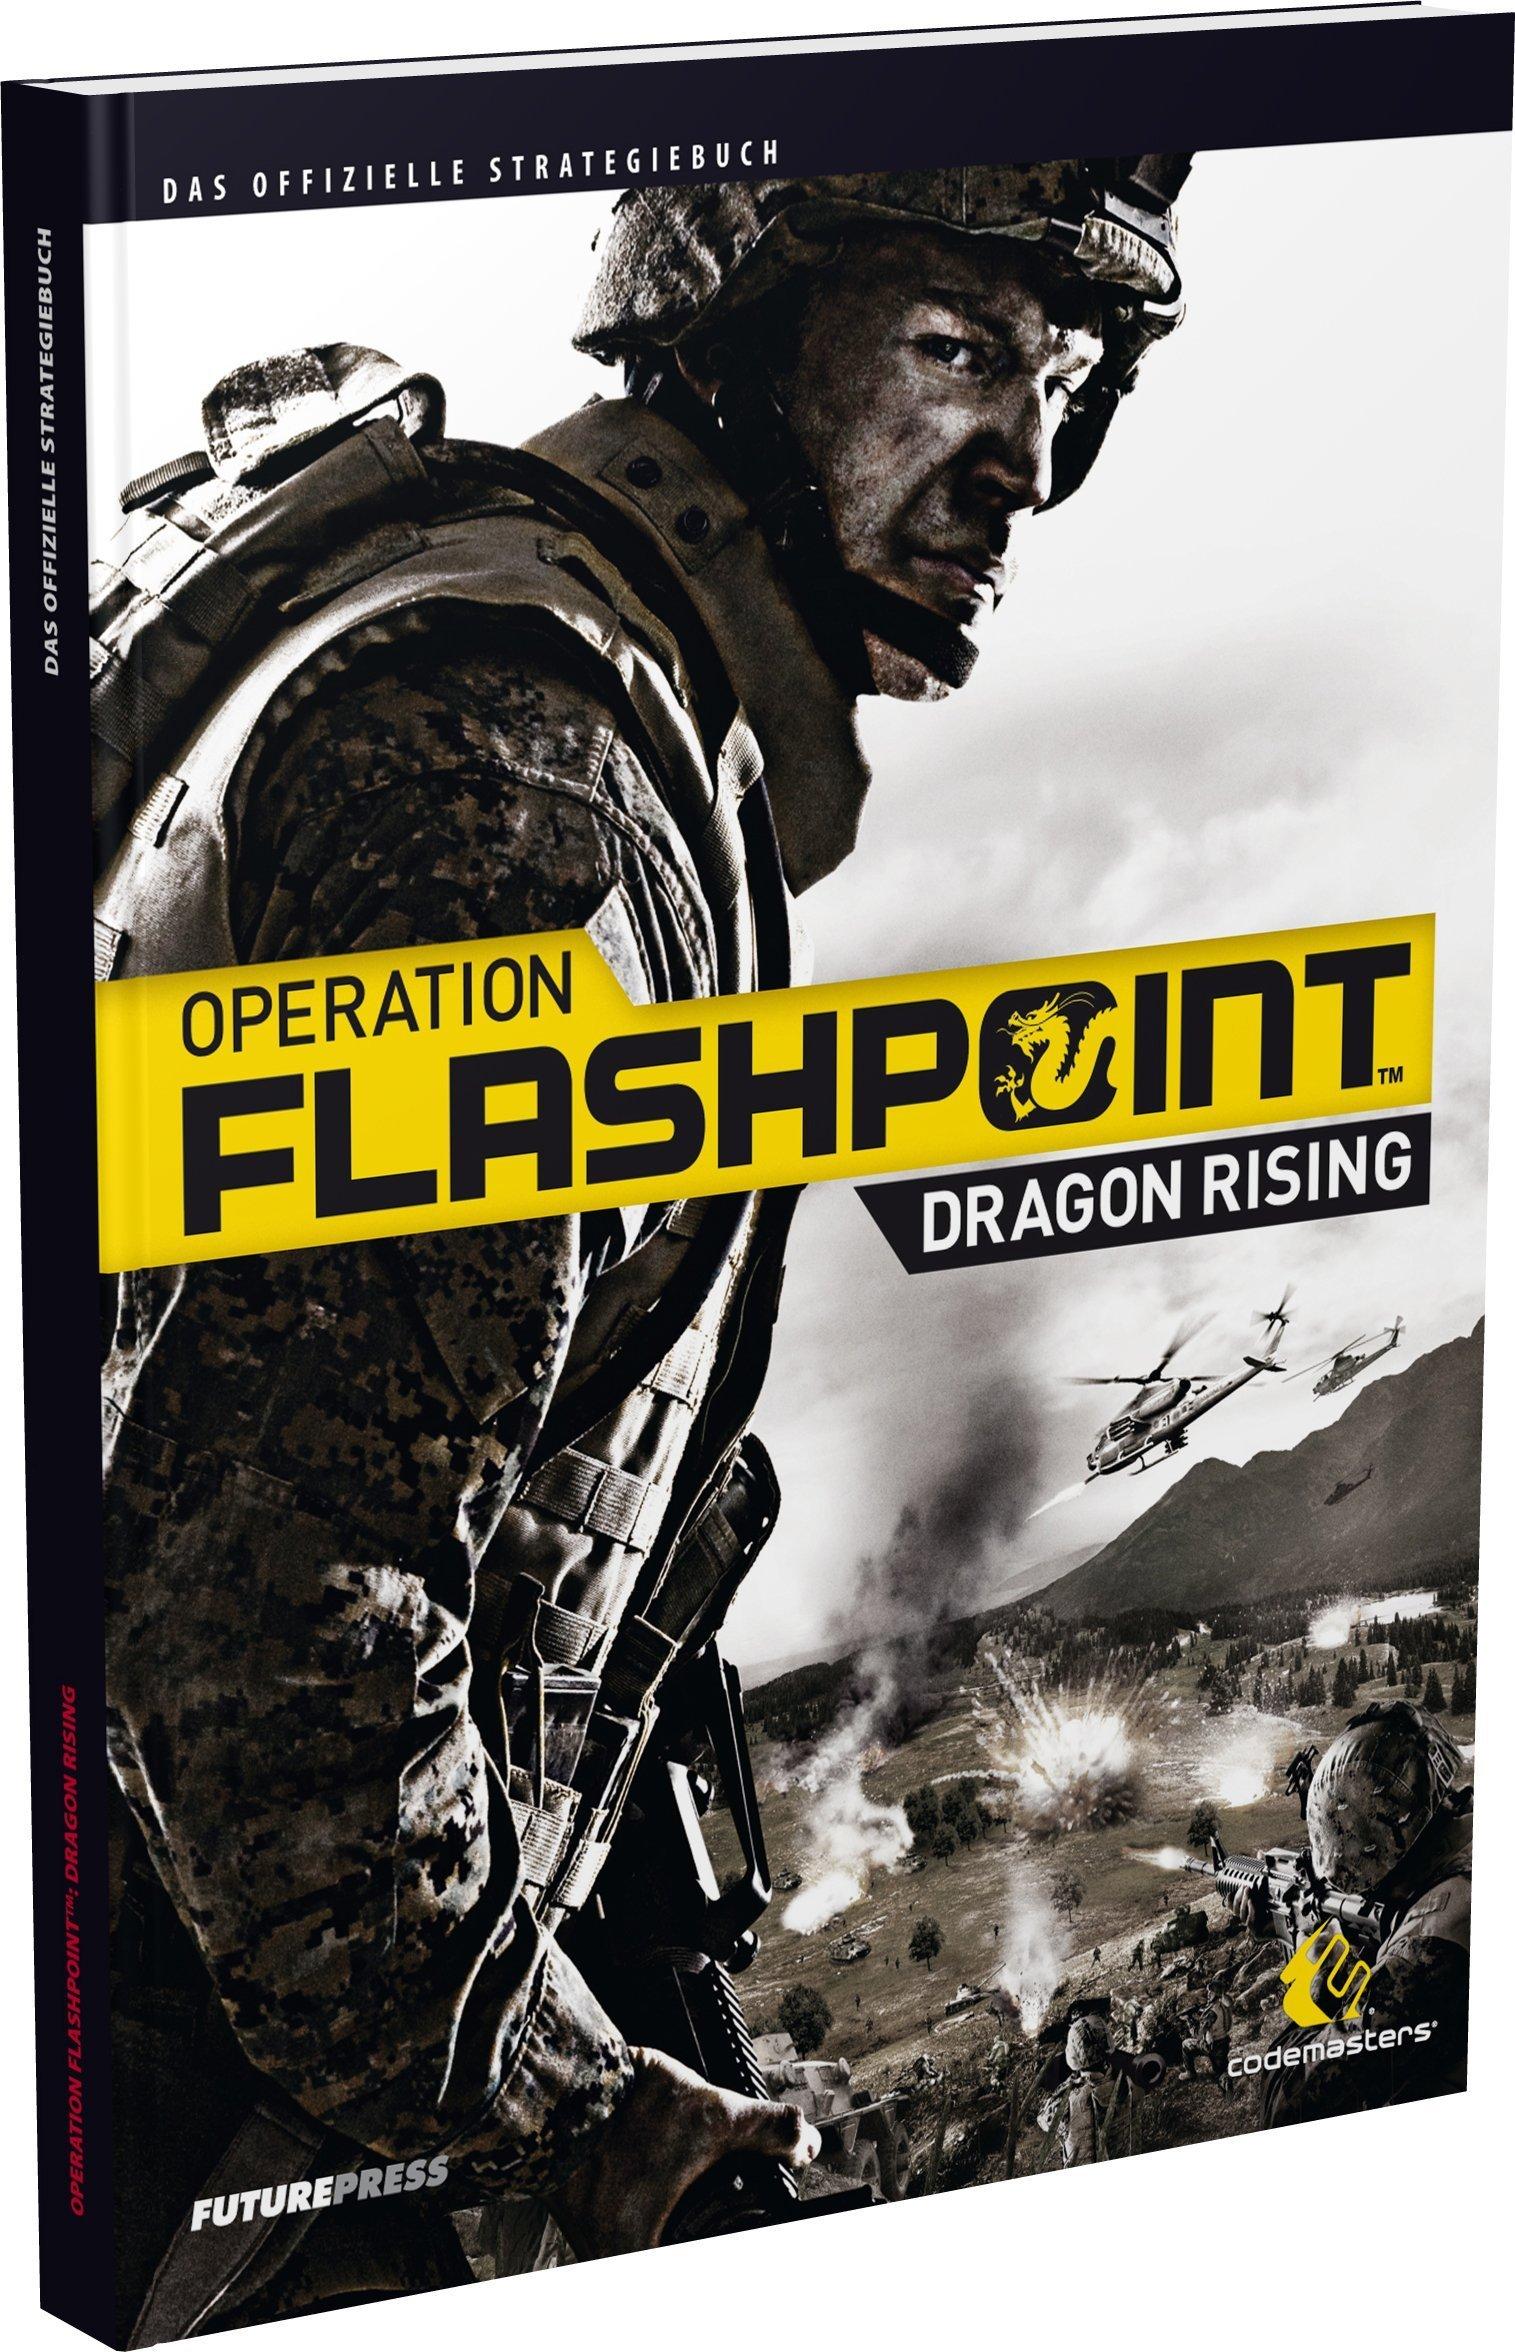 Operation Flashpoint: Dragon Rising - Das offizielle Strategiebuch